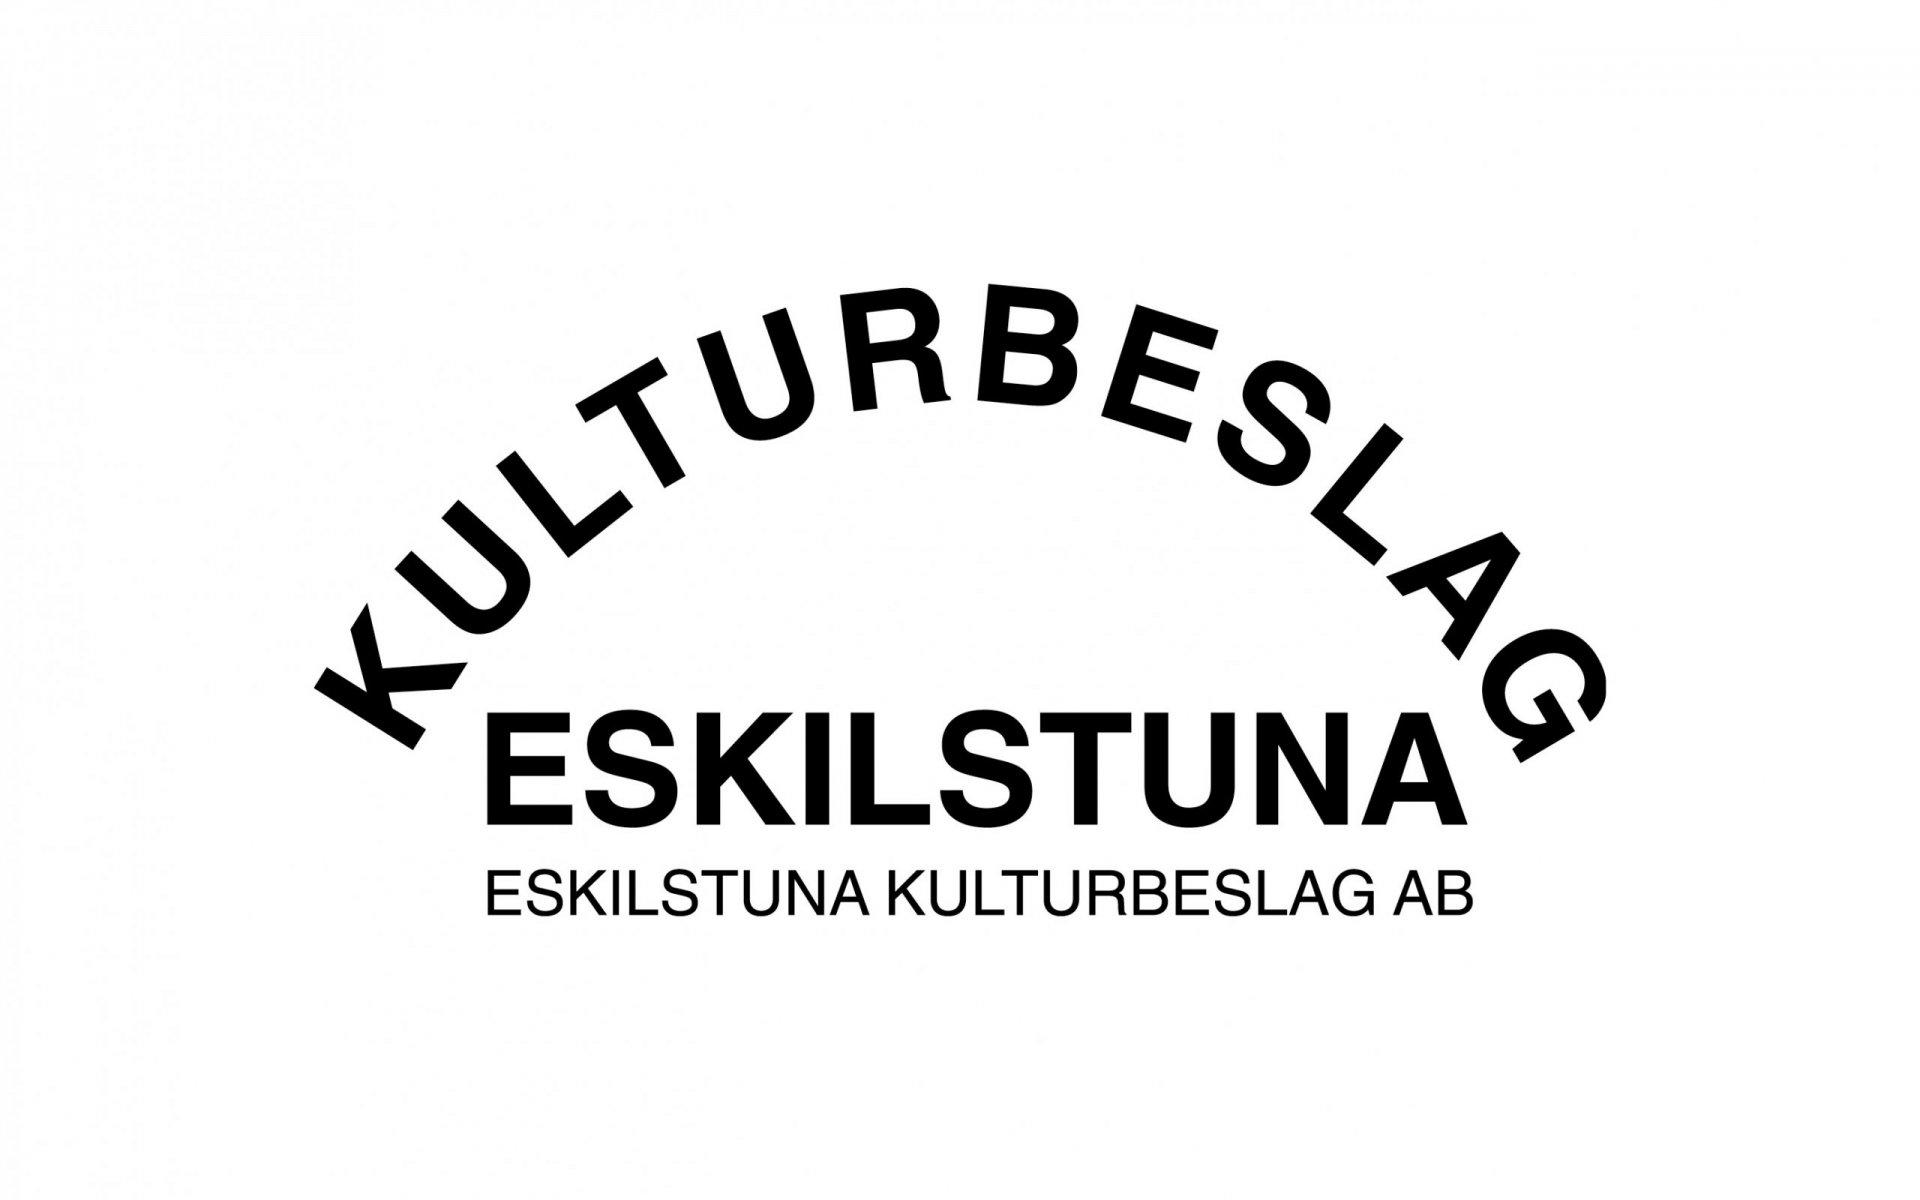 Kulturbeslag-eskilstuna-logotyp